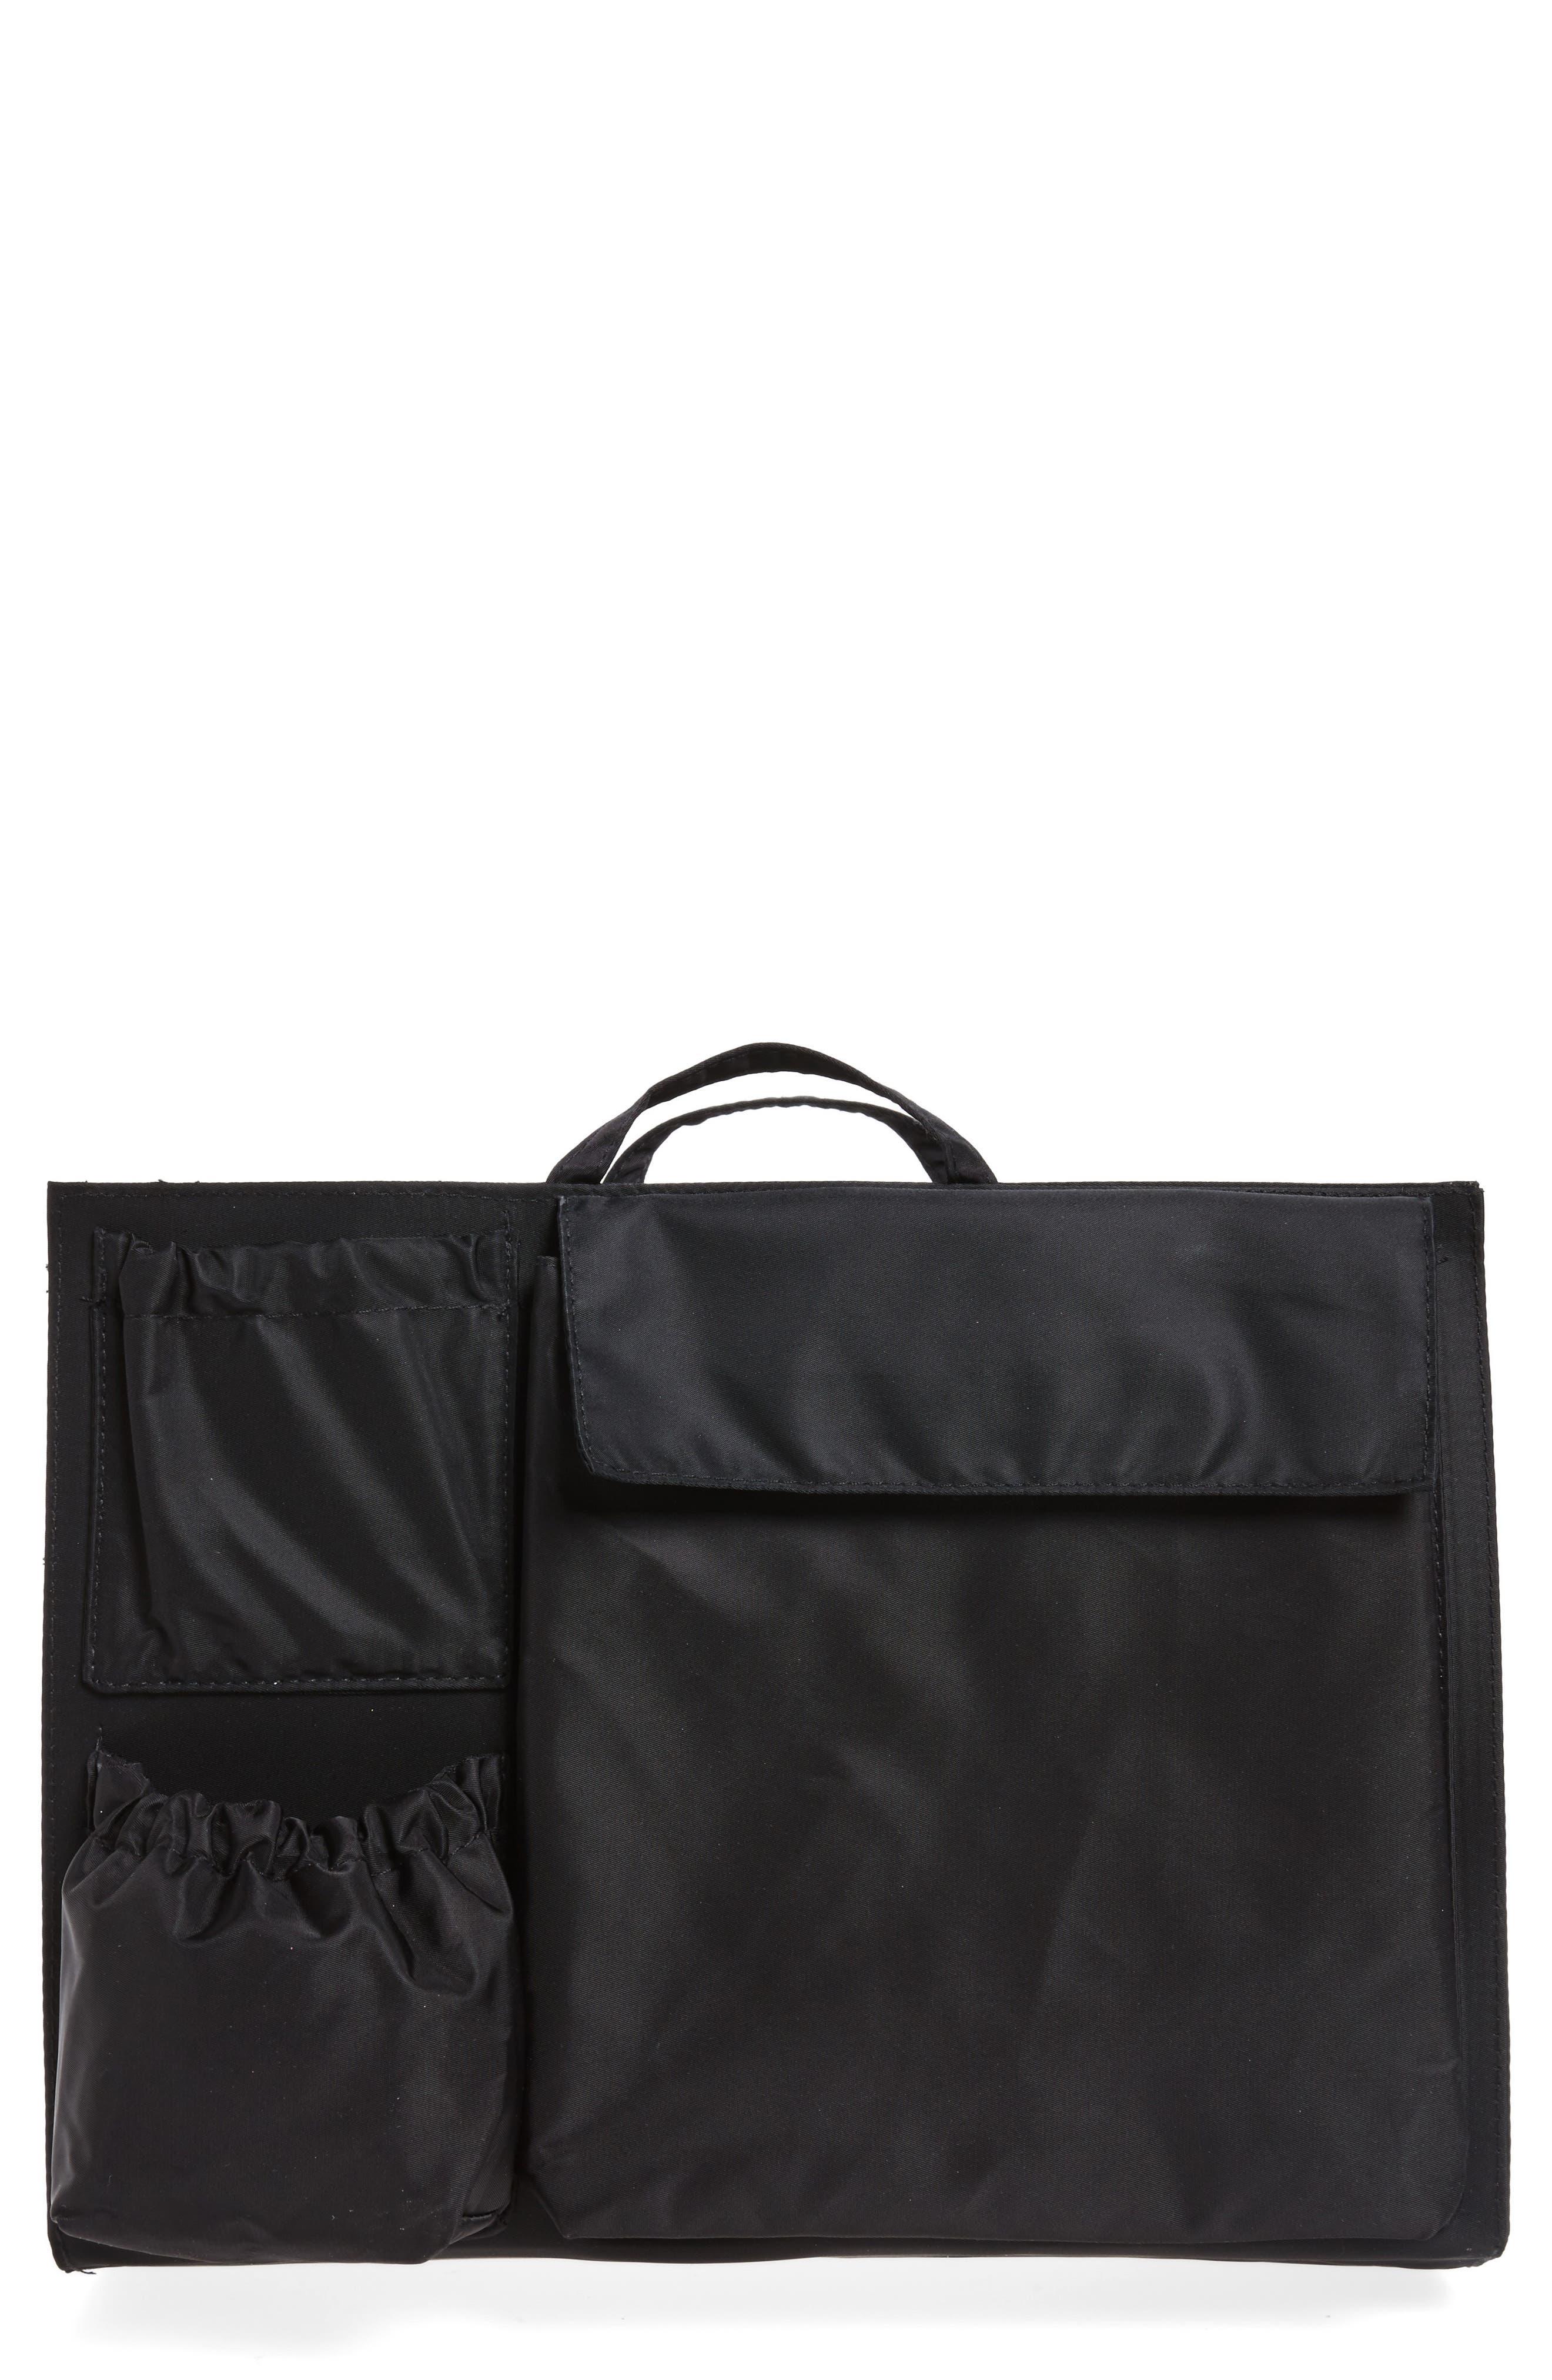 Organization Handbag Insert,                         Main,                         color, CLASSIC BLACK